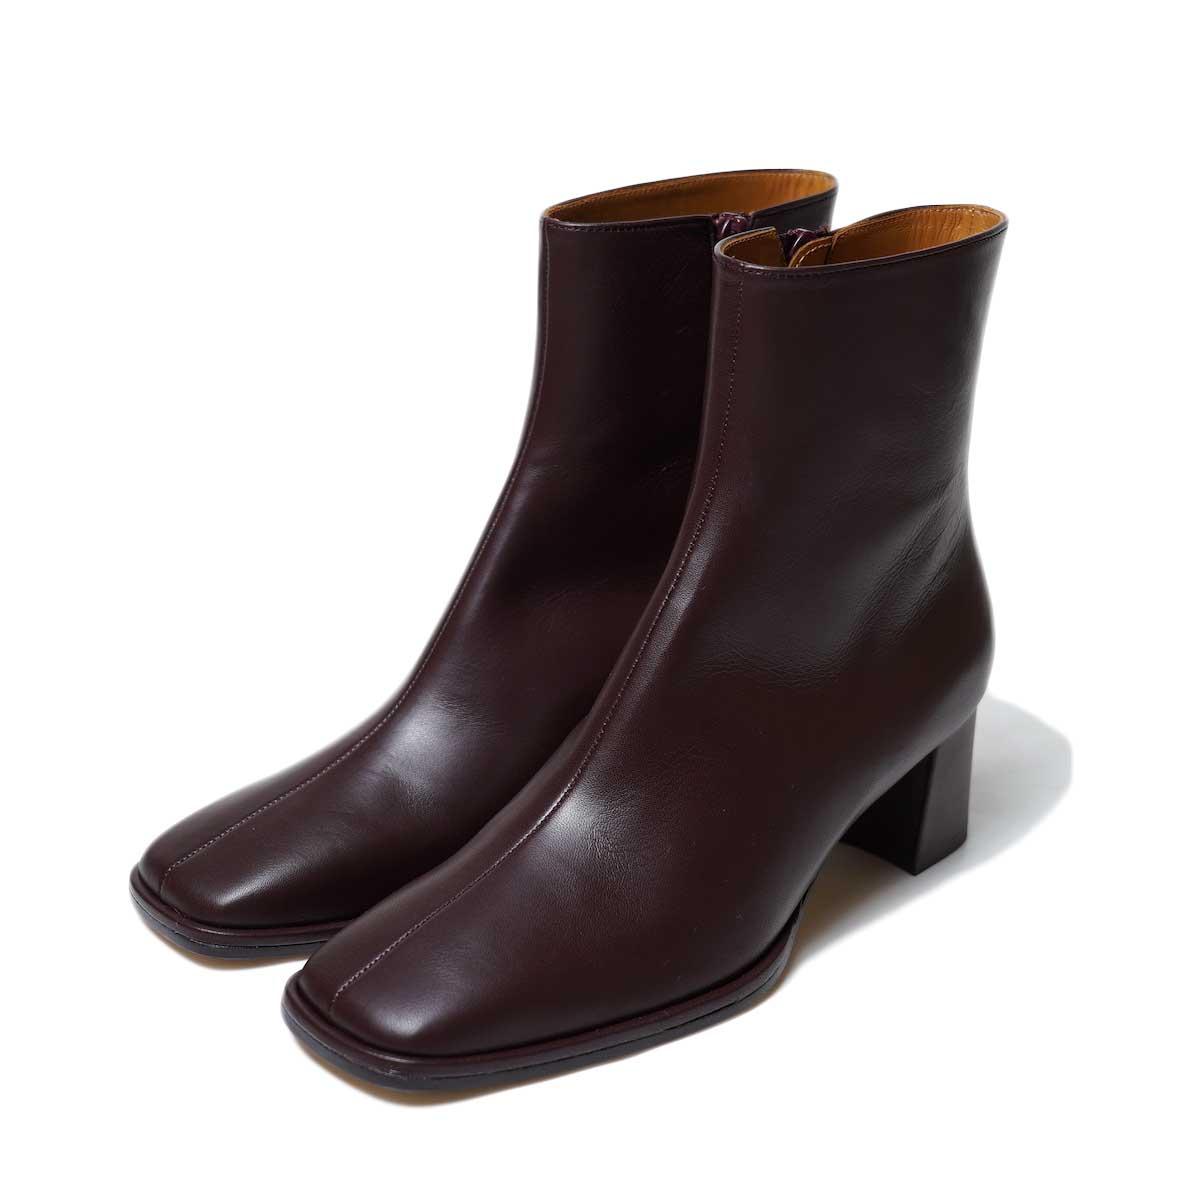 JANESMITH / SQUARE TOE SHORT BOOTS (Burgandy)